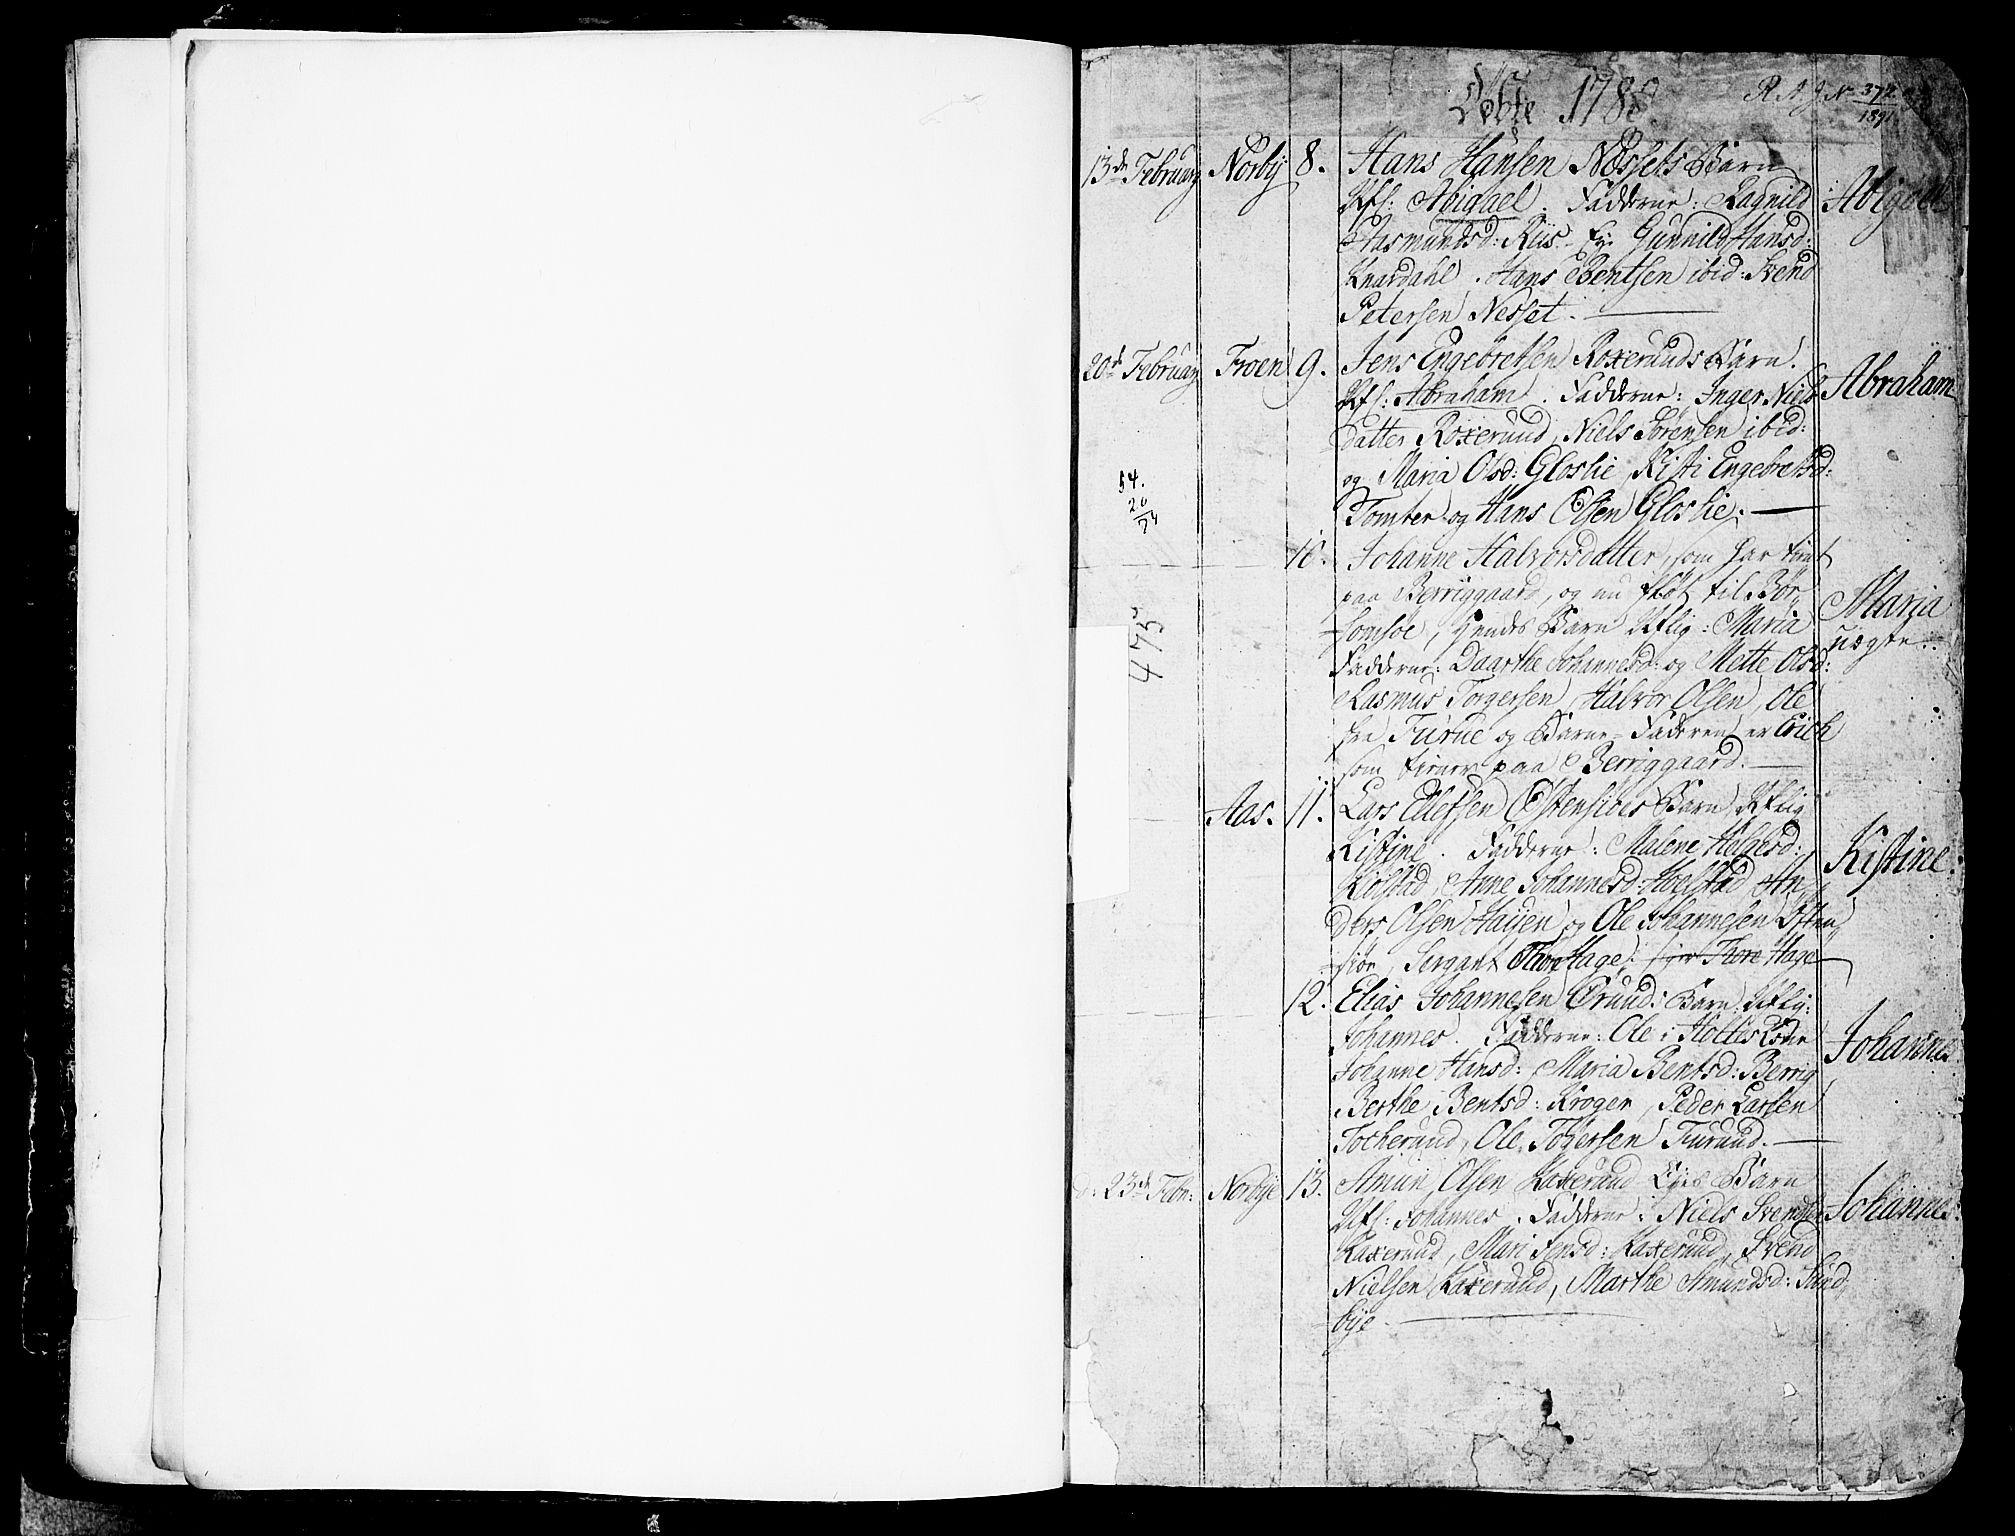 SAO, Ås prestekontor Kirkebøker, F/Fa/L0002: Ministerialbok nr. I 2, 1778-1813, s. 23